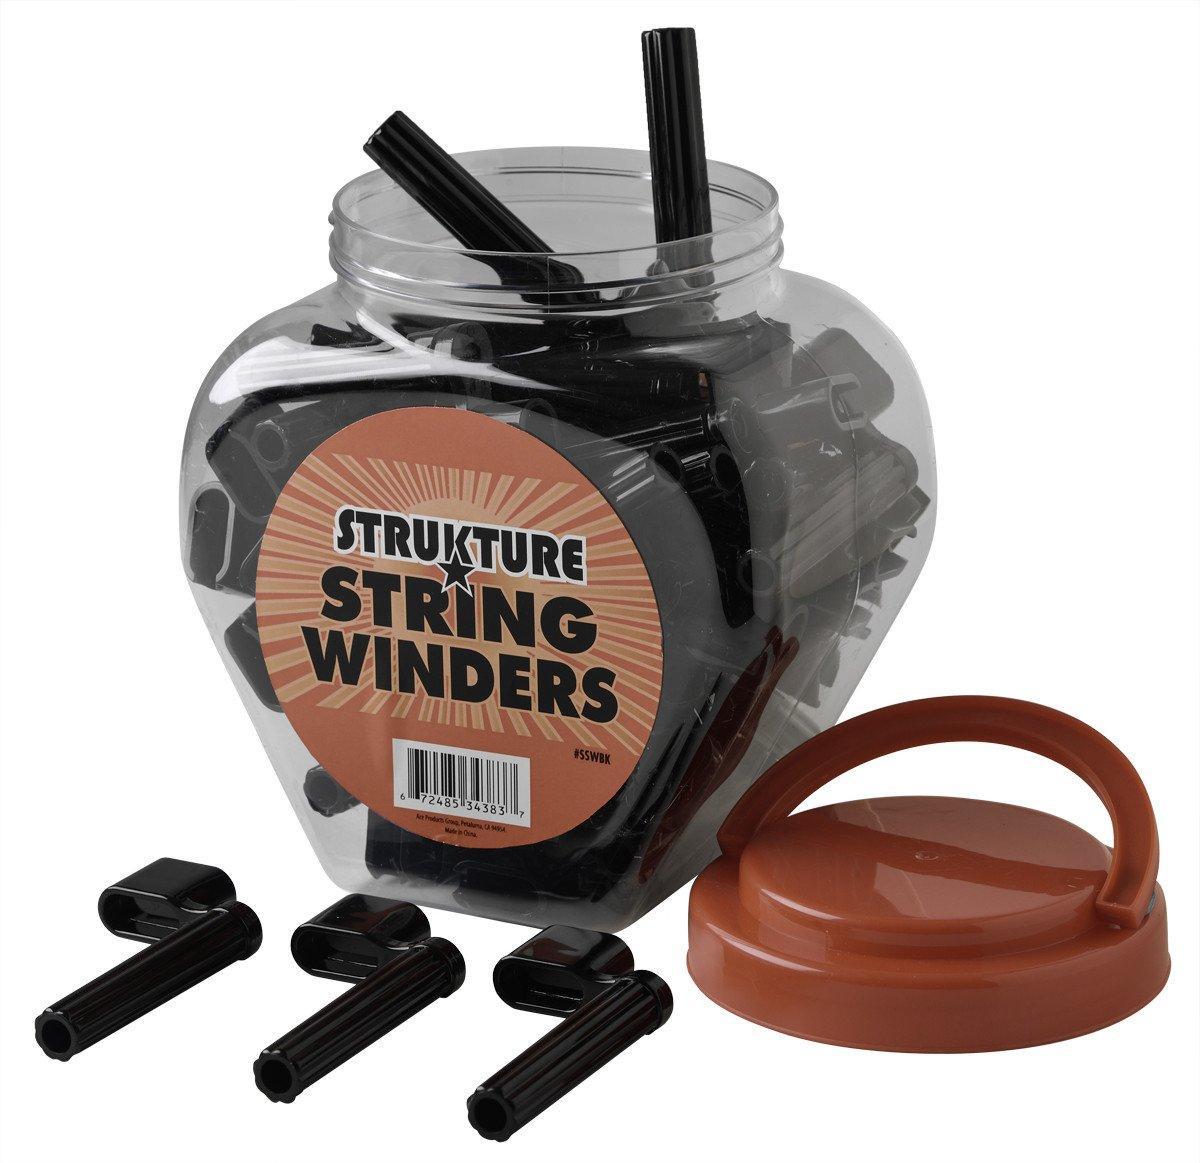 Strukture String Winder (50 pcs. Per Fishbowl Display)